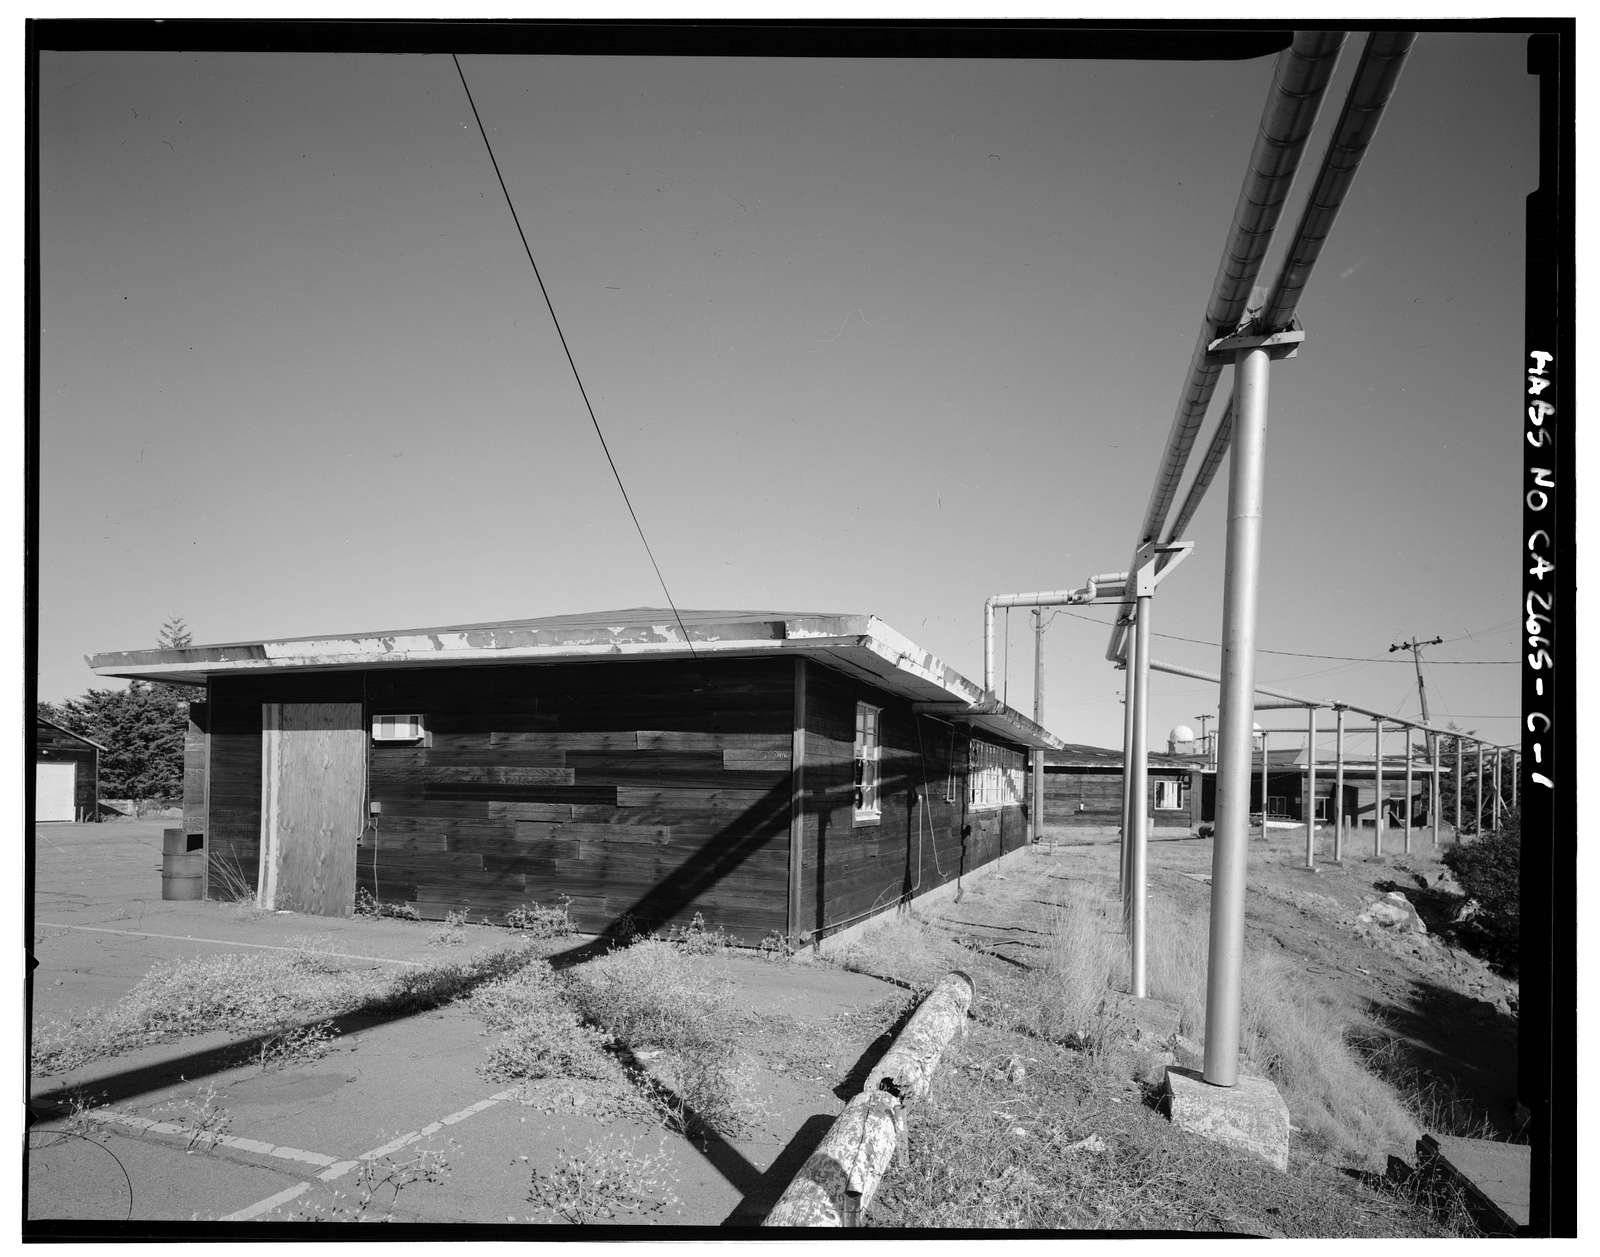 Mill Valley Air Force Station, Civil Engineering Maintenance Shop, East Ridgecrest Boulevard, Mount Tamalpais, Mill Valley, Marin County, CA